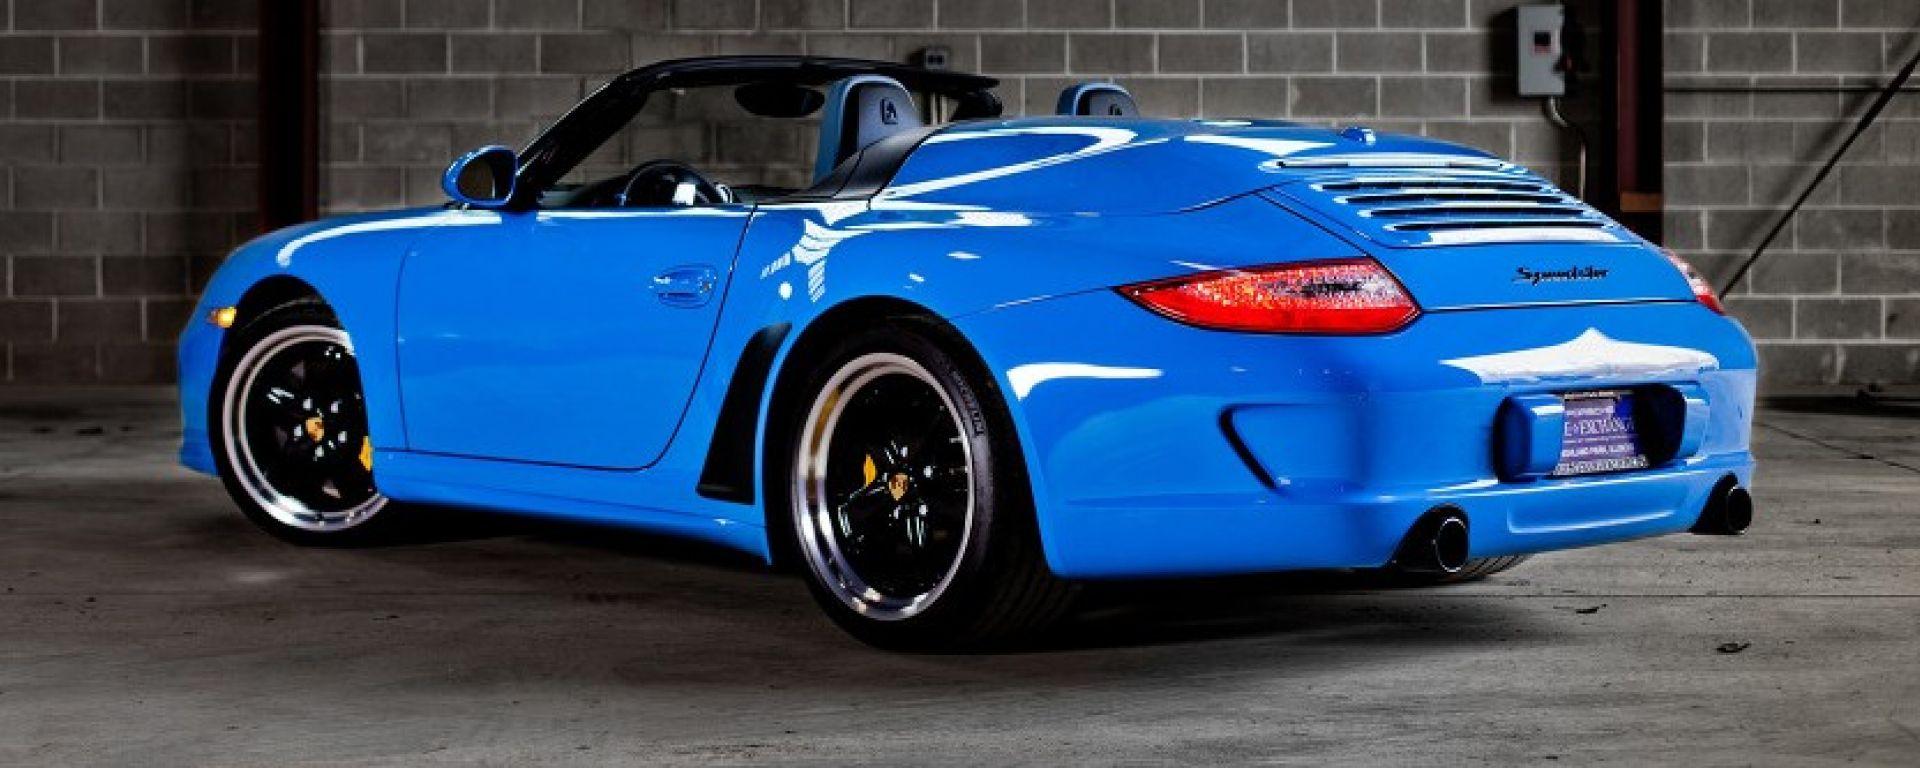 Porsche 911 Speedster Al Salone Di Francoforte 232 Attesa